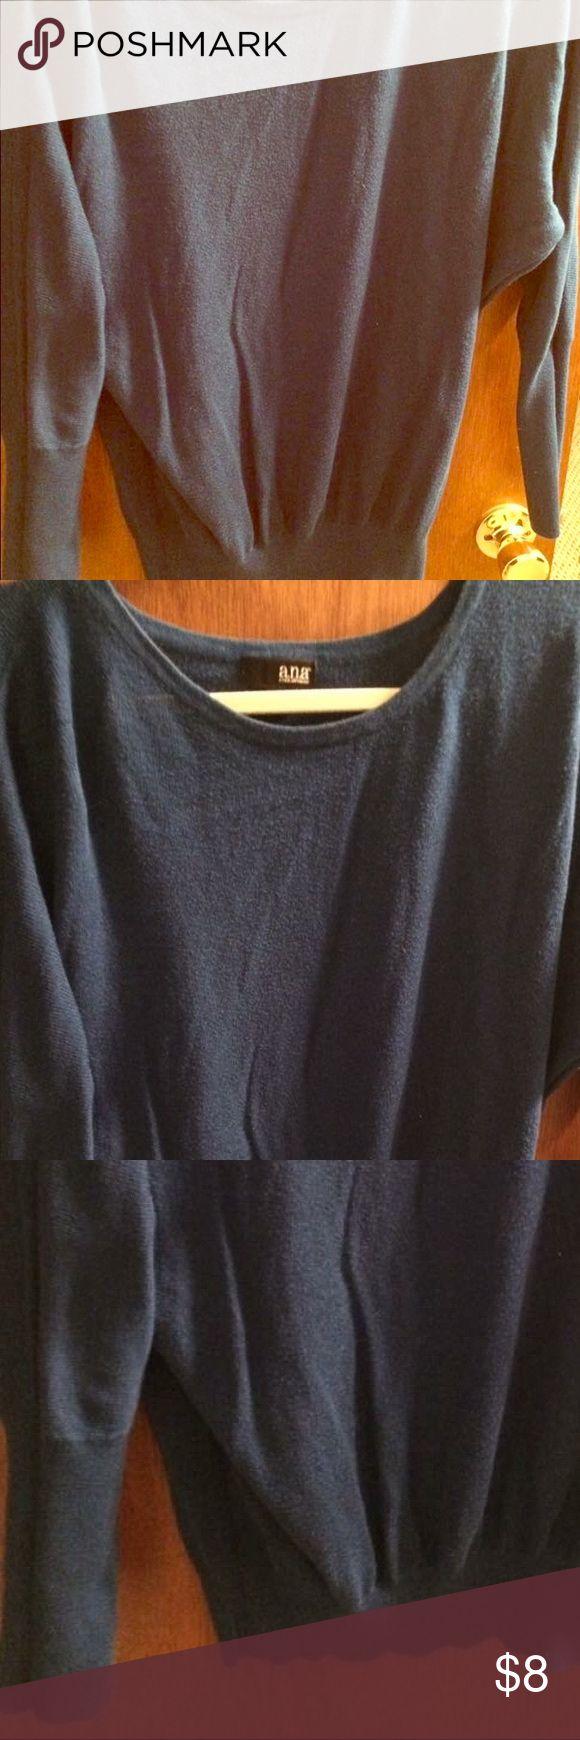 Ana blue sweater size small Ana sweater purchased at JCPenny. Blue size small. jcpenney Sweaters Crew & Scoop Necks